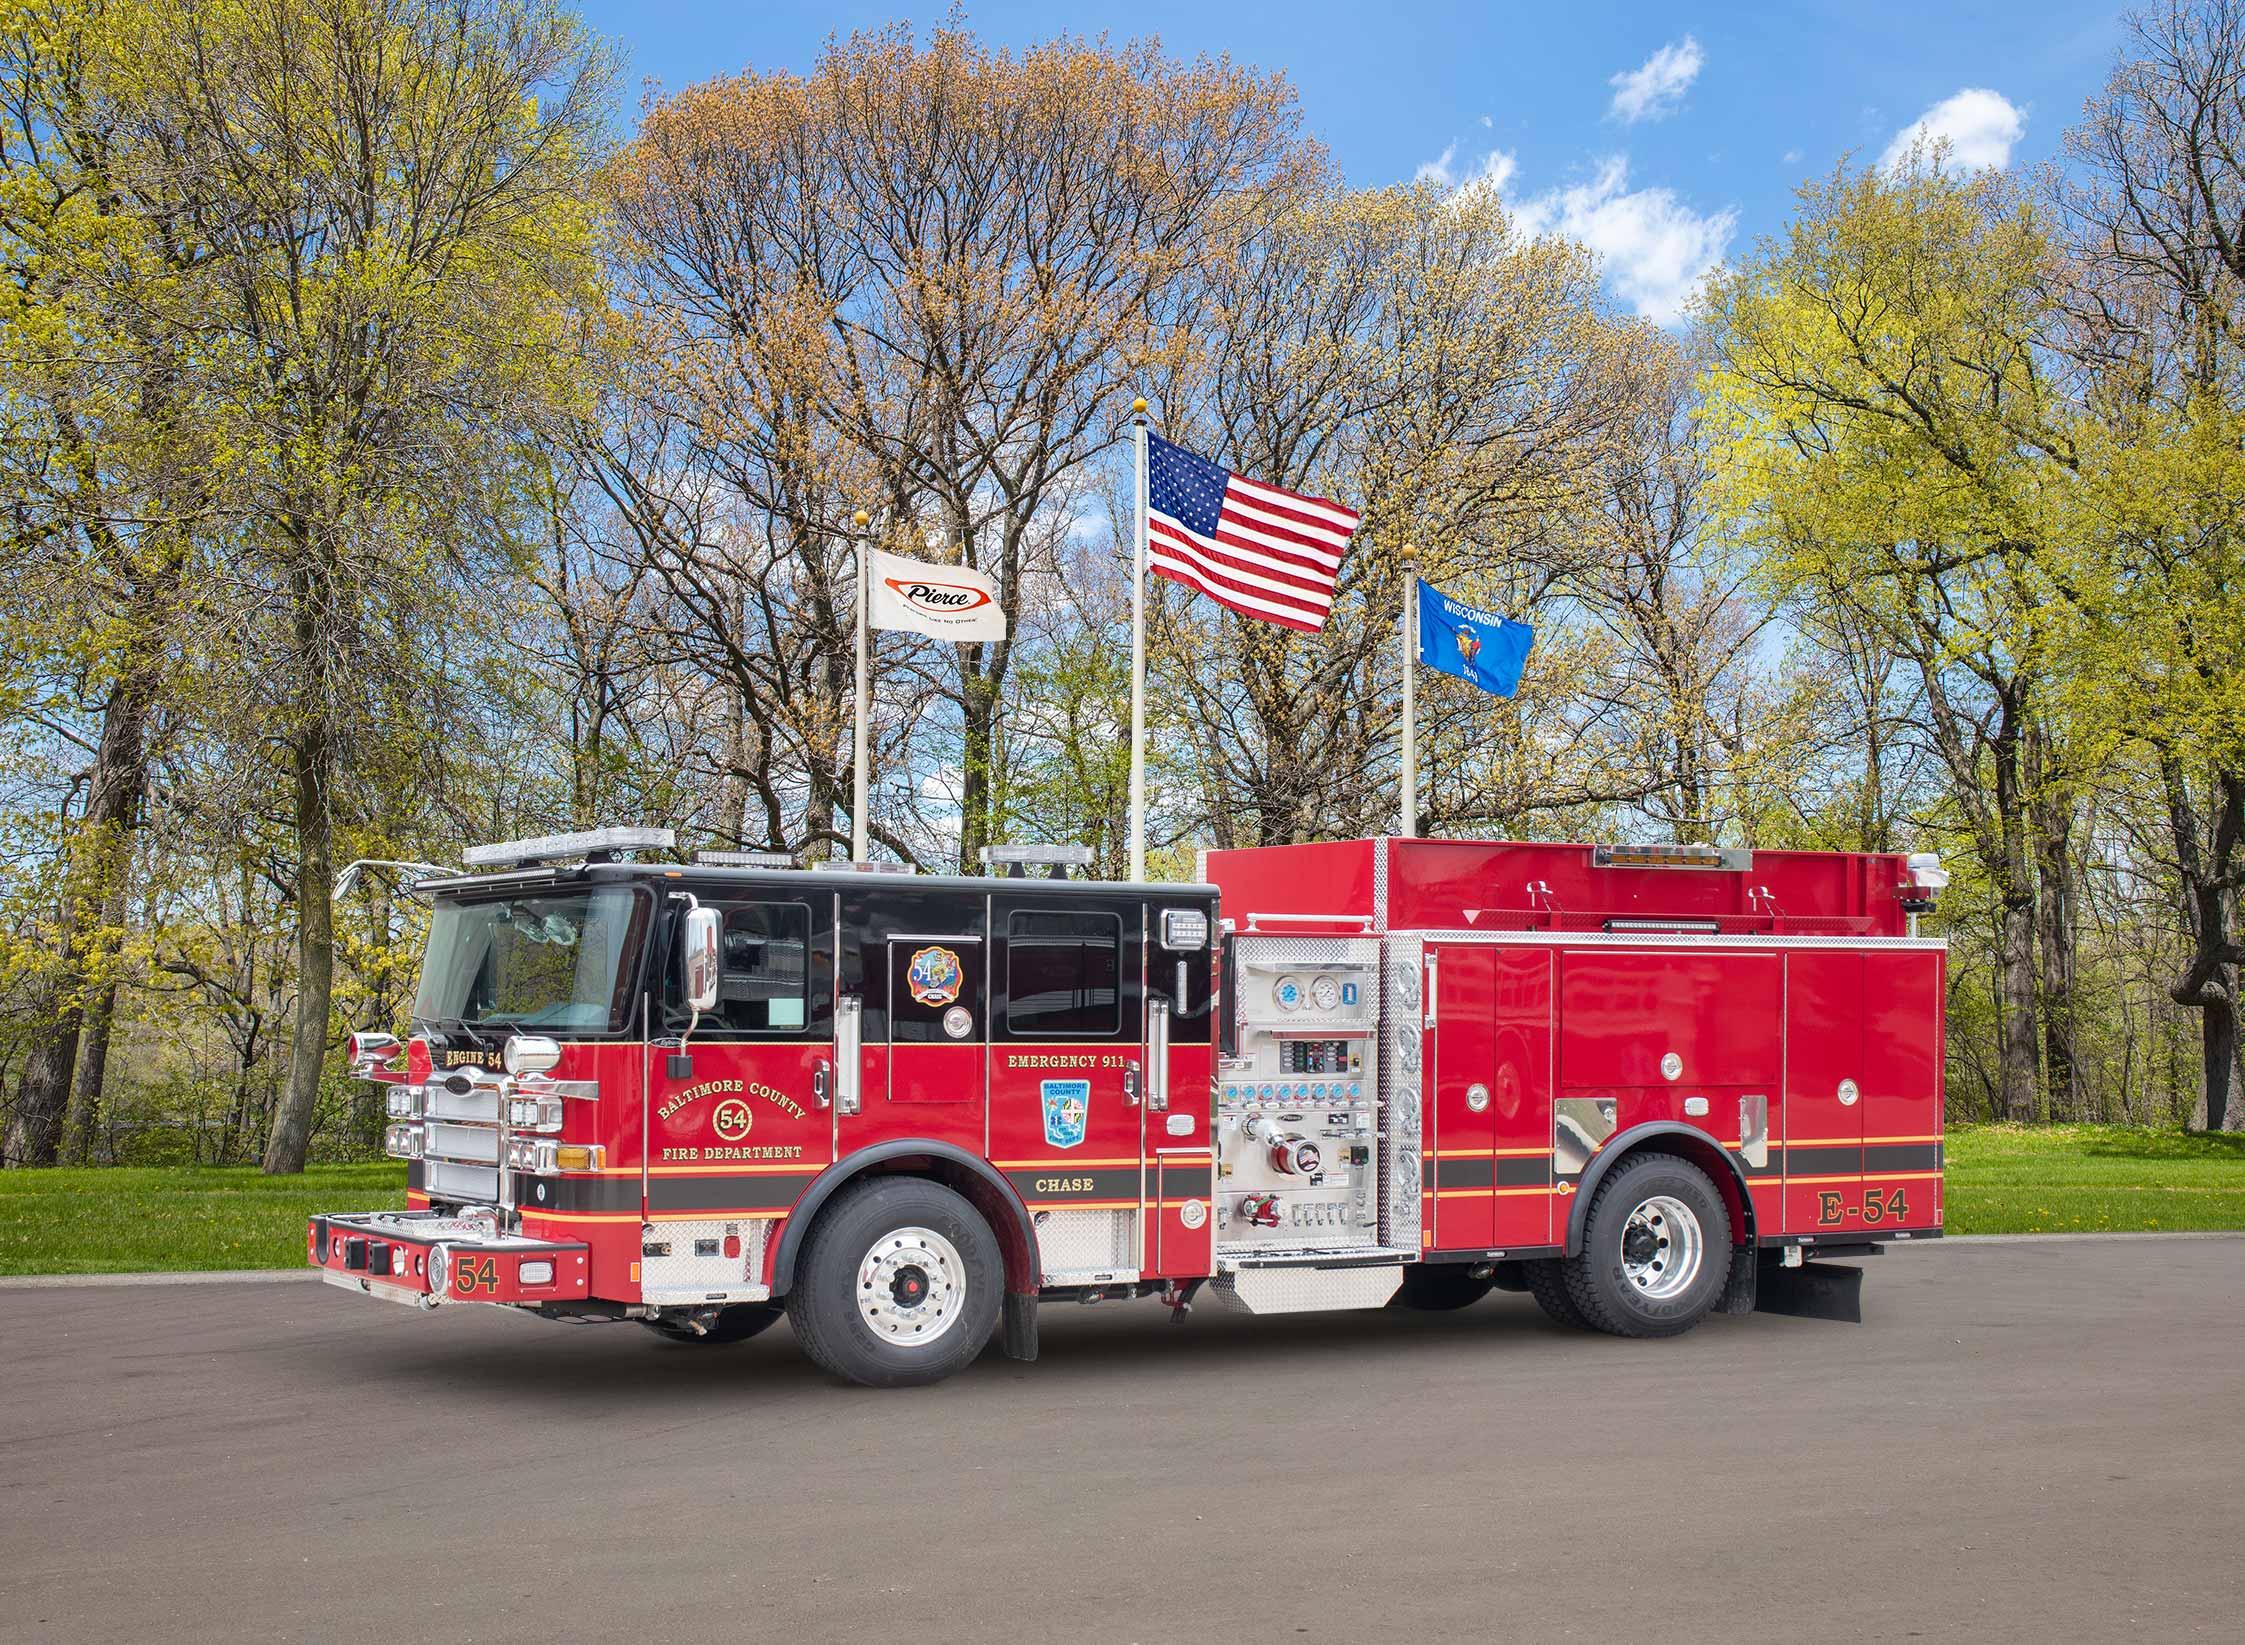 Baltimore County Fire Department - Pumper